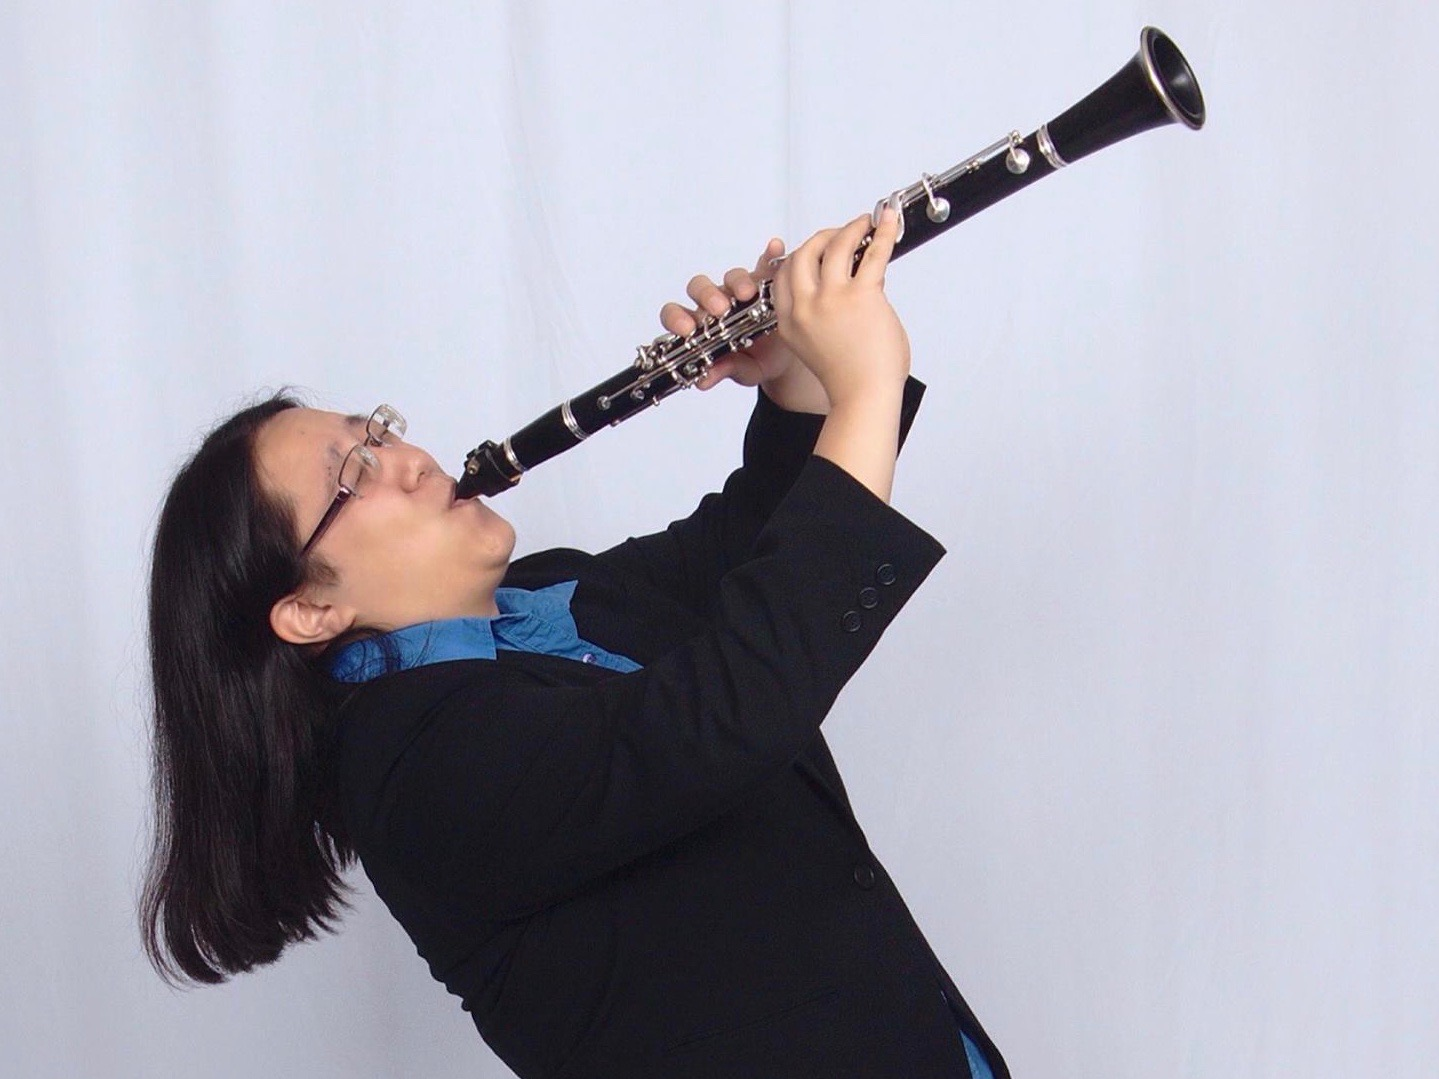 Patricia Crispino plays the clarinet